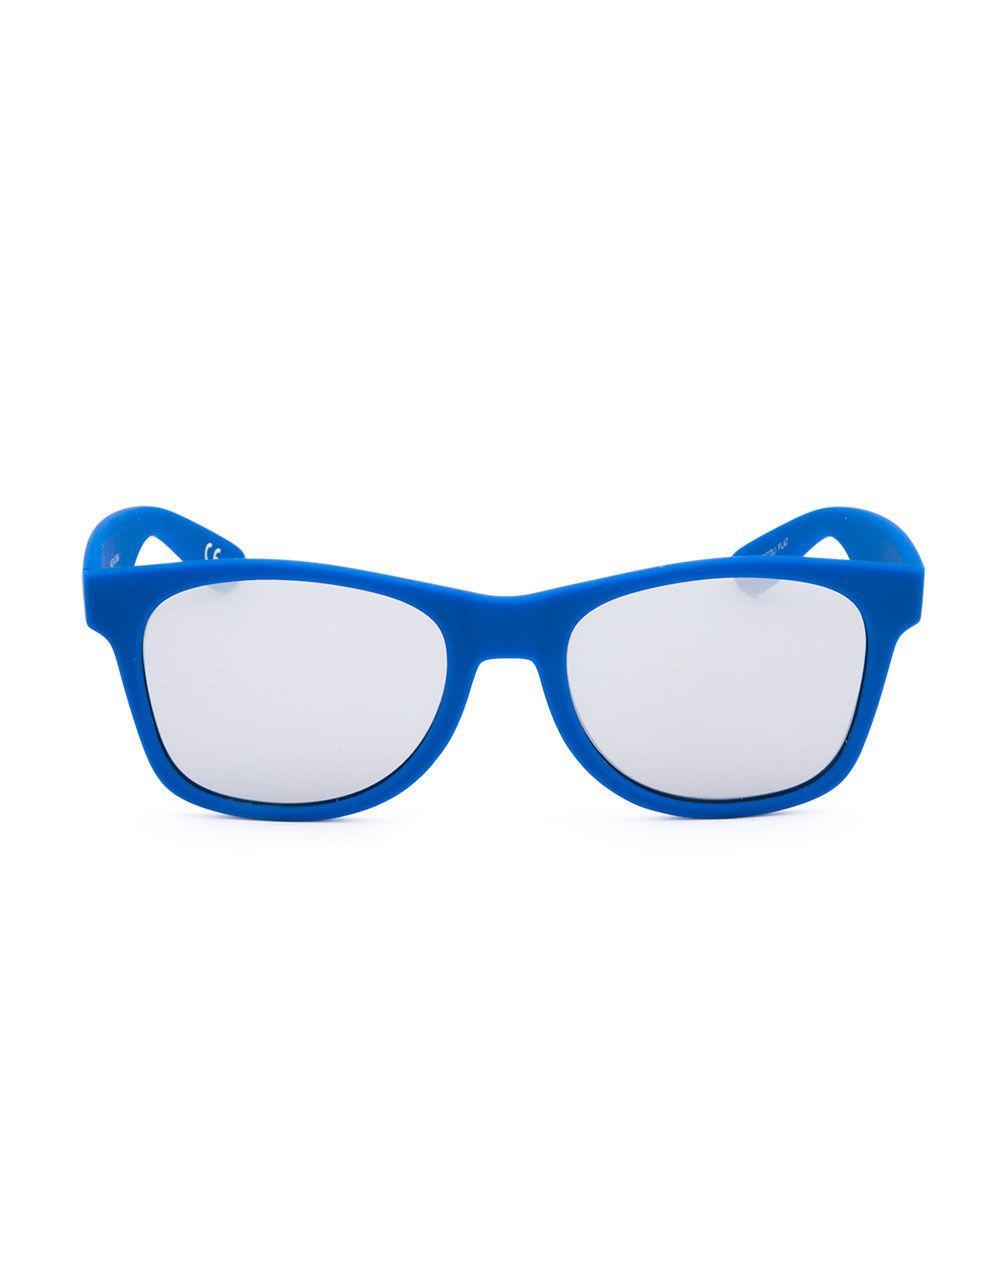 b5faf67d238 Vans Spicoli Flat Lapis Blue Sunglasses